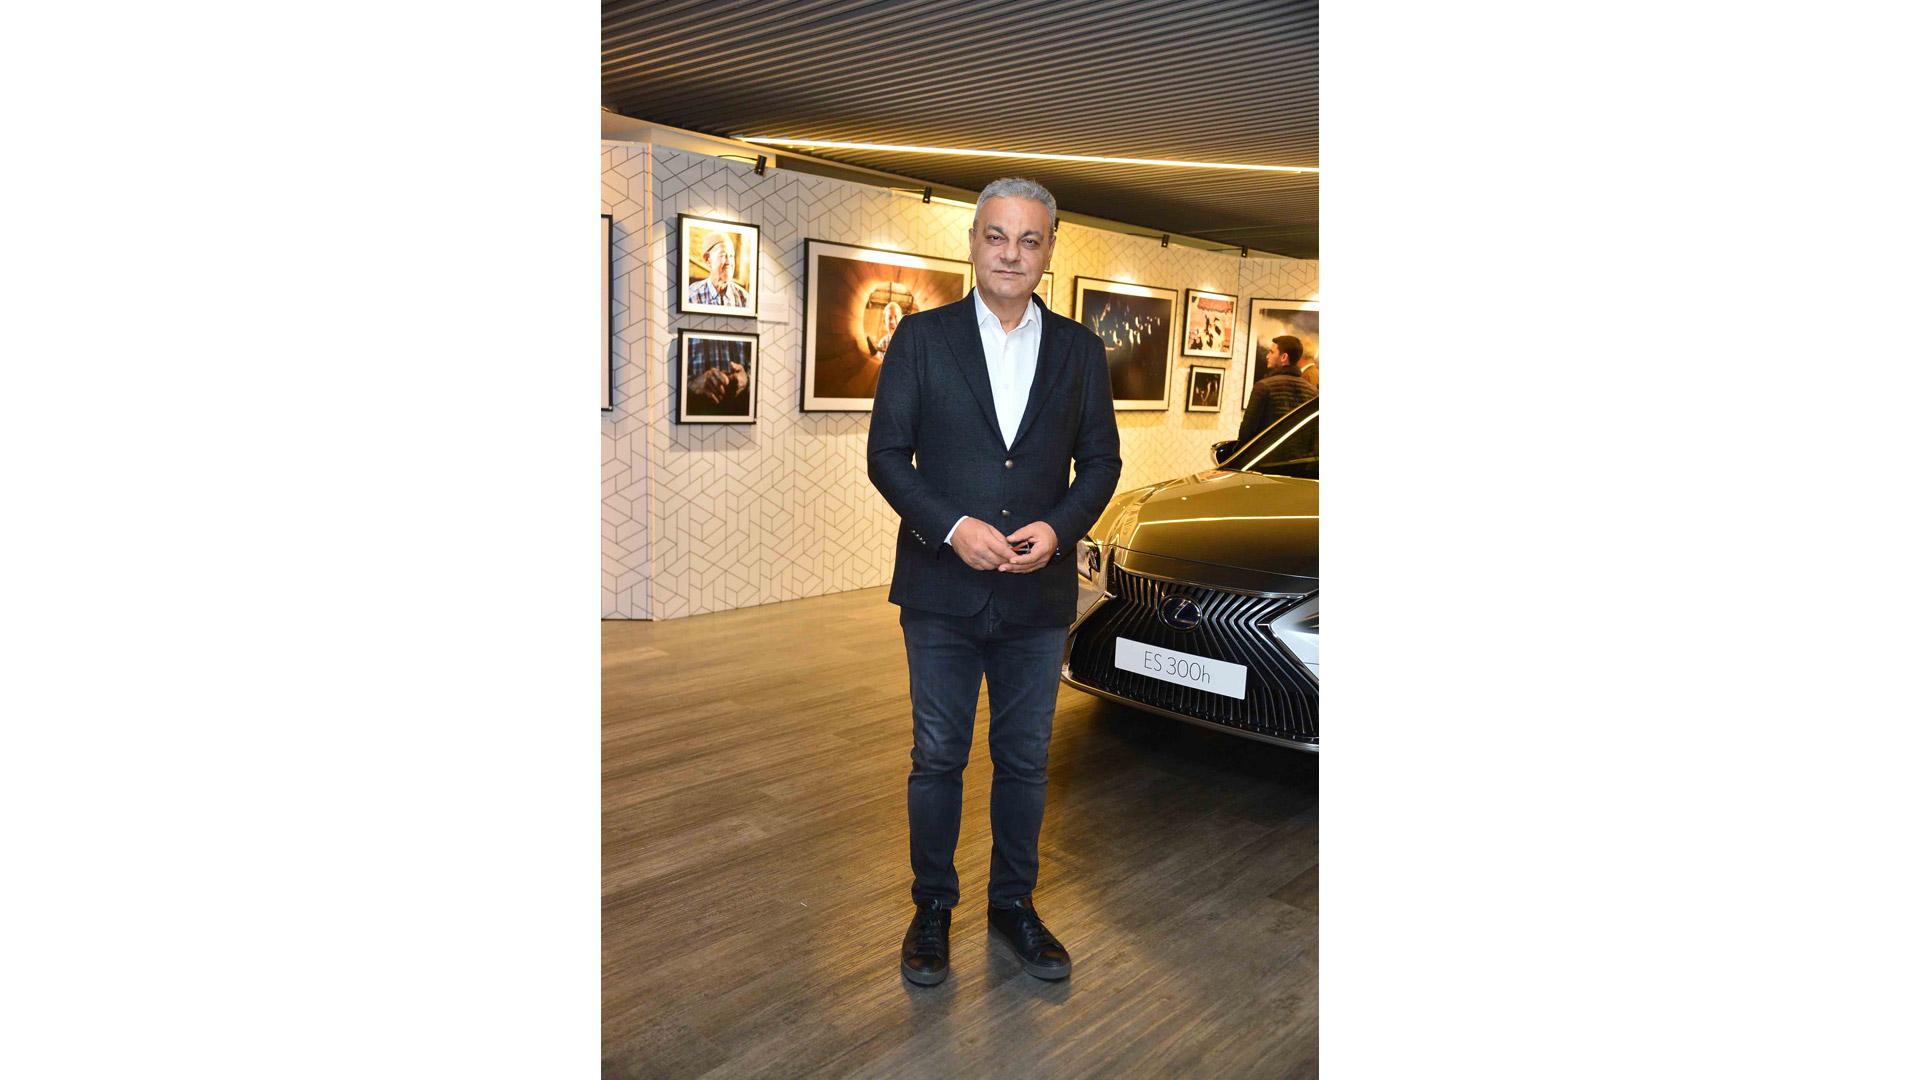 Lexus Fotograf Sergisi gallery07